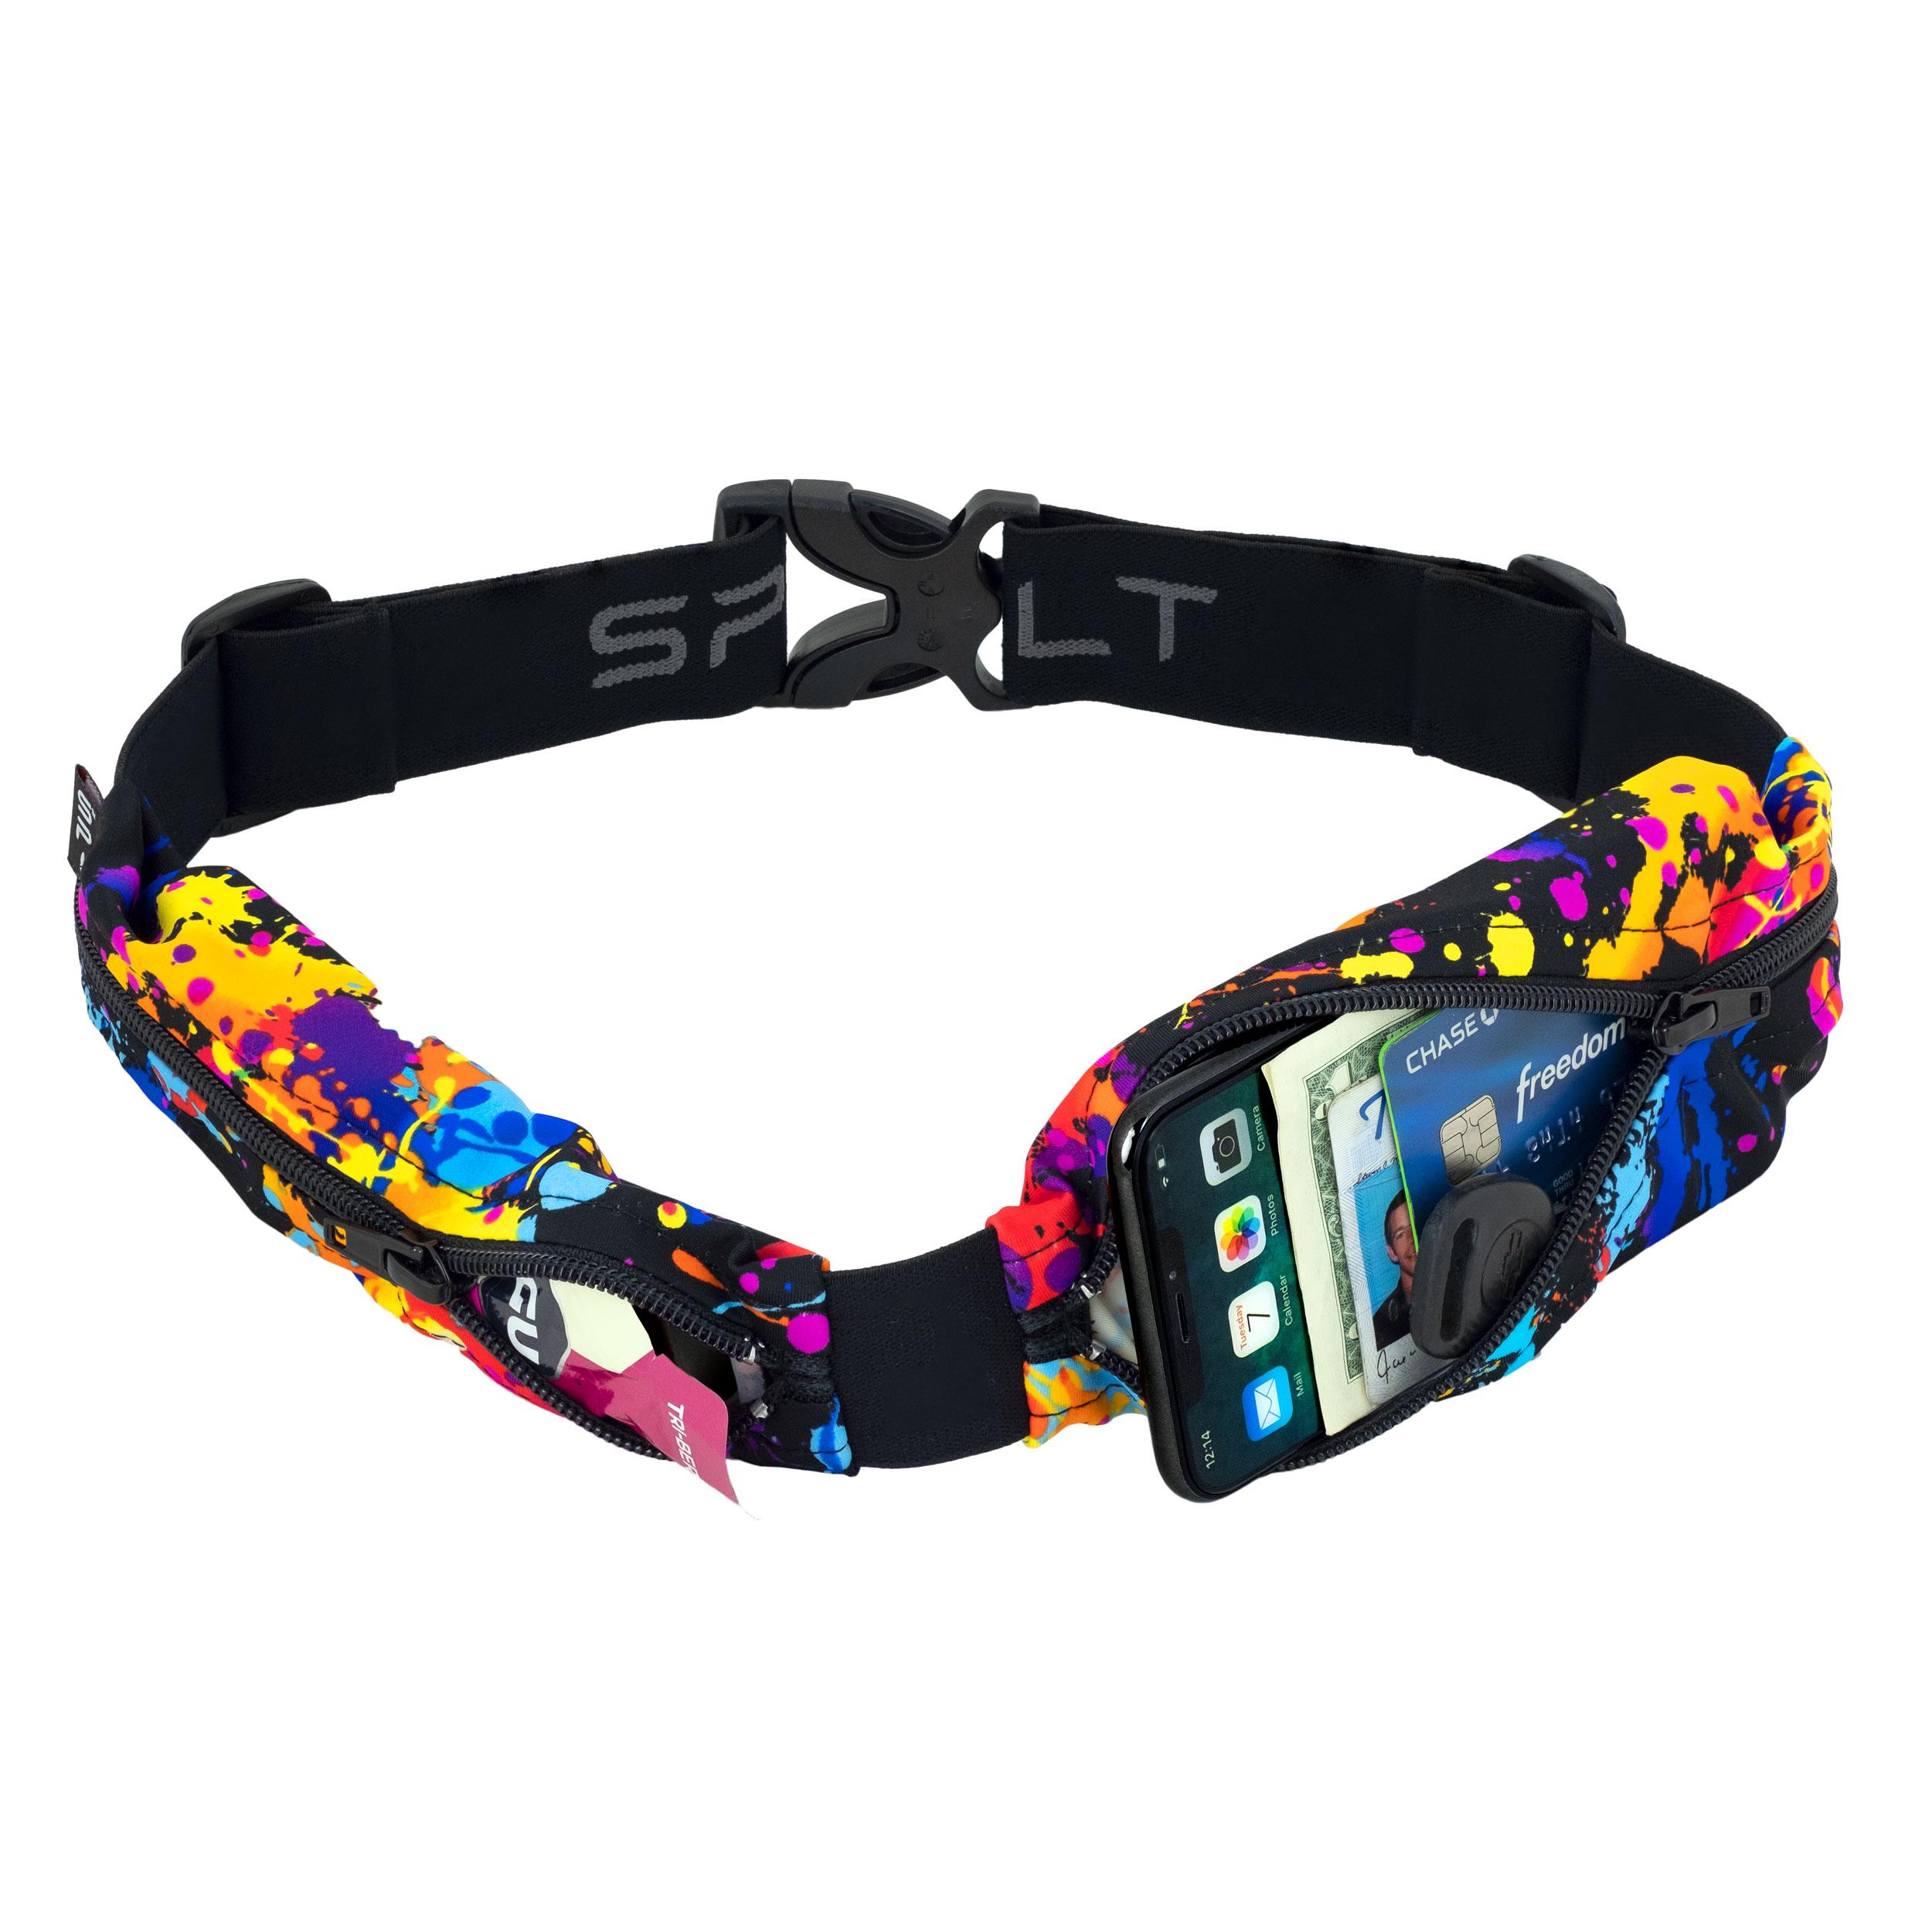 SPIbelt Dual Pocket Pro